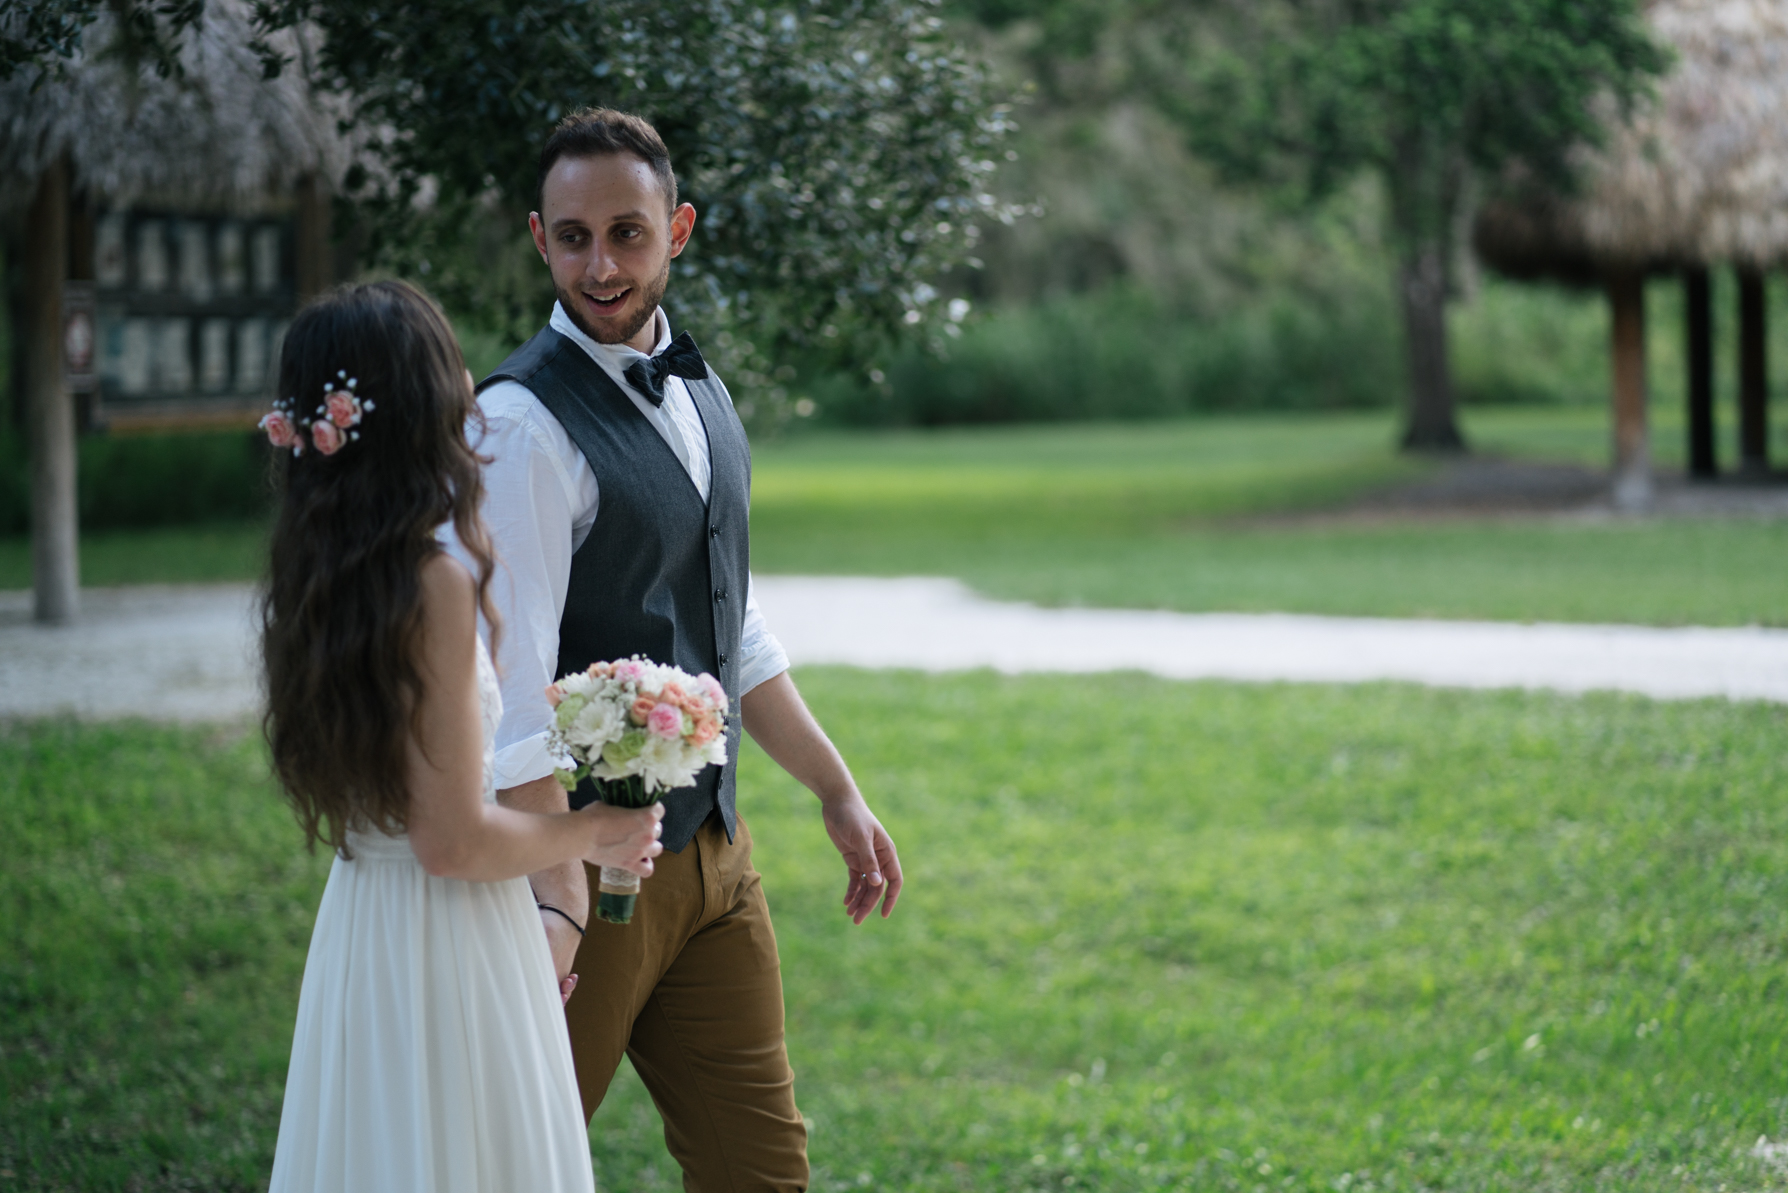 bluestream_wedding_bosisio_hightlights_111-5.jpg